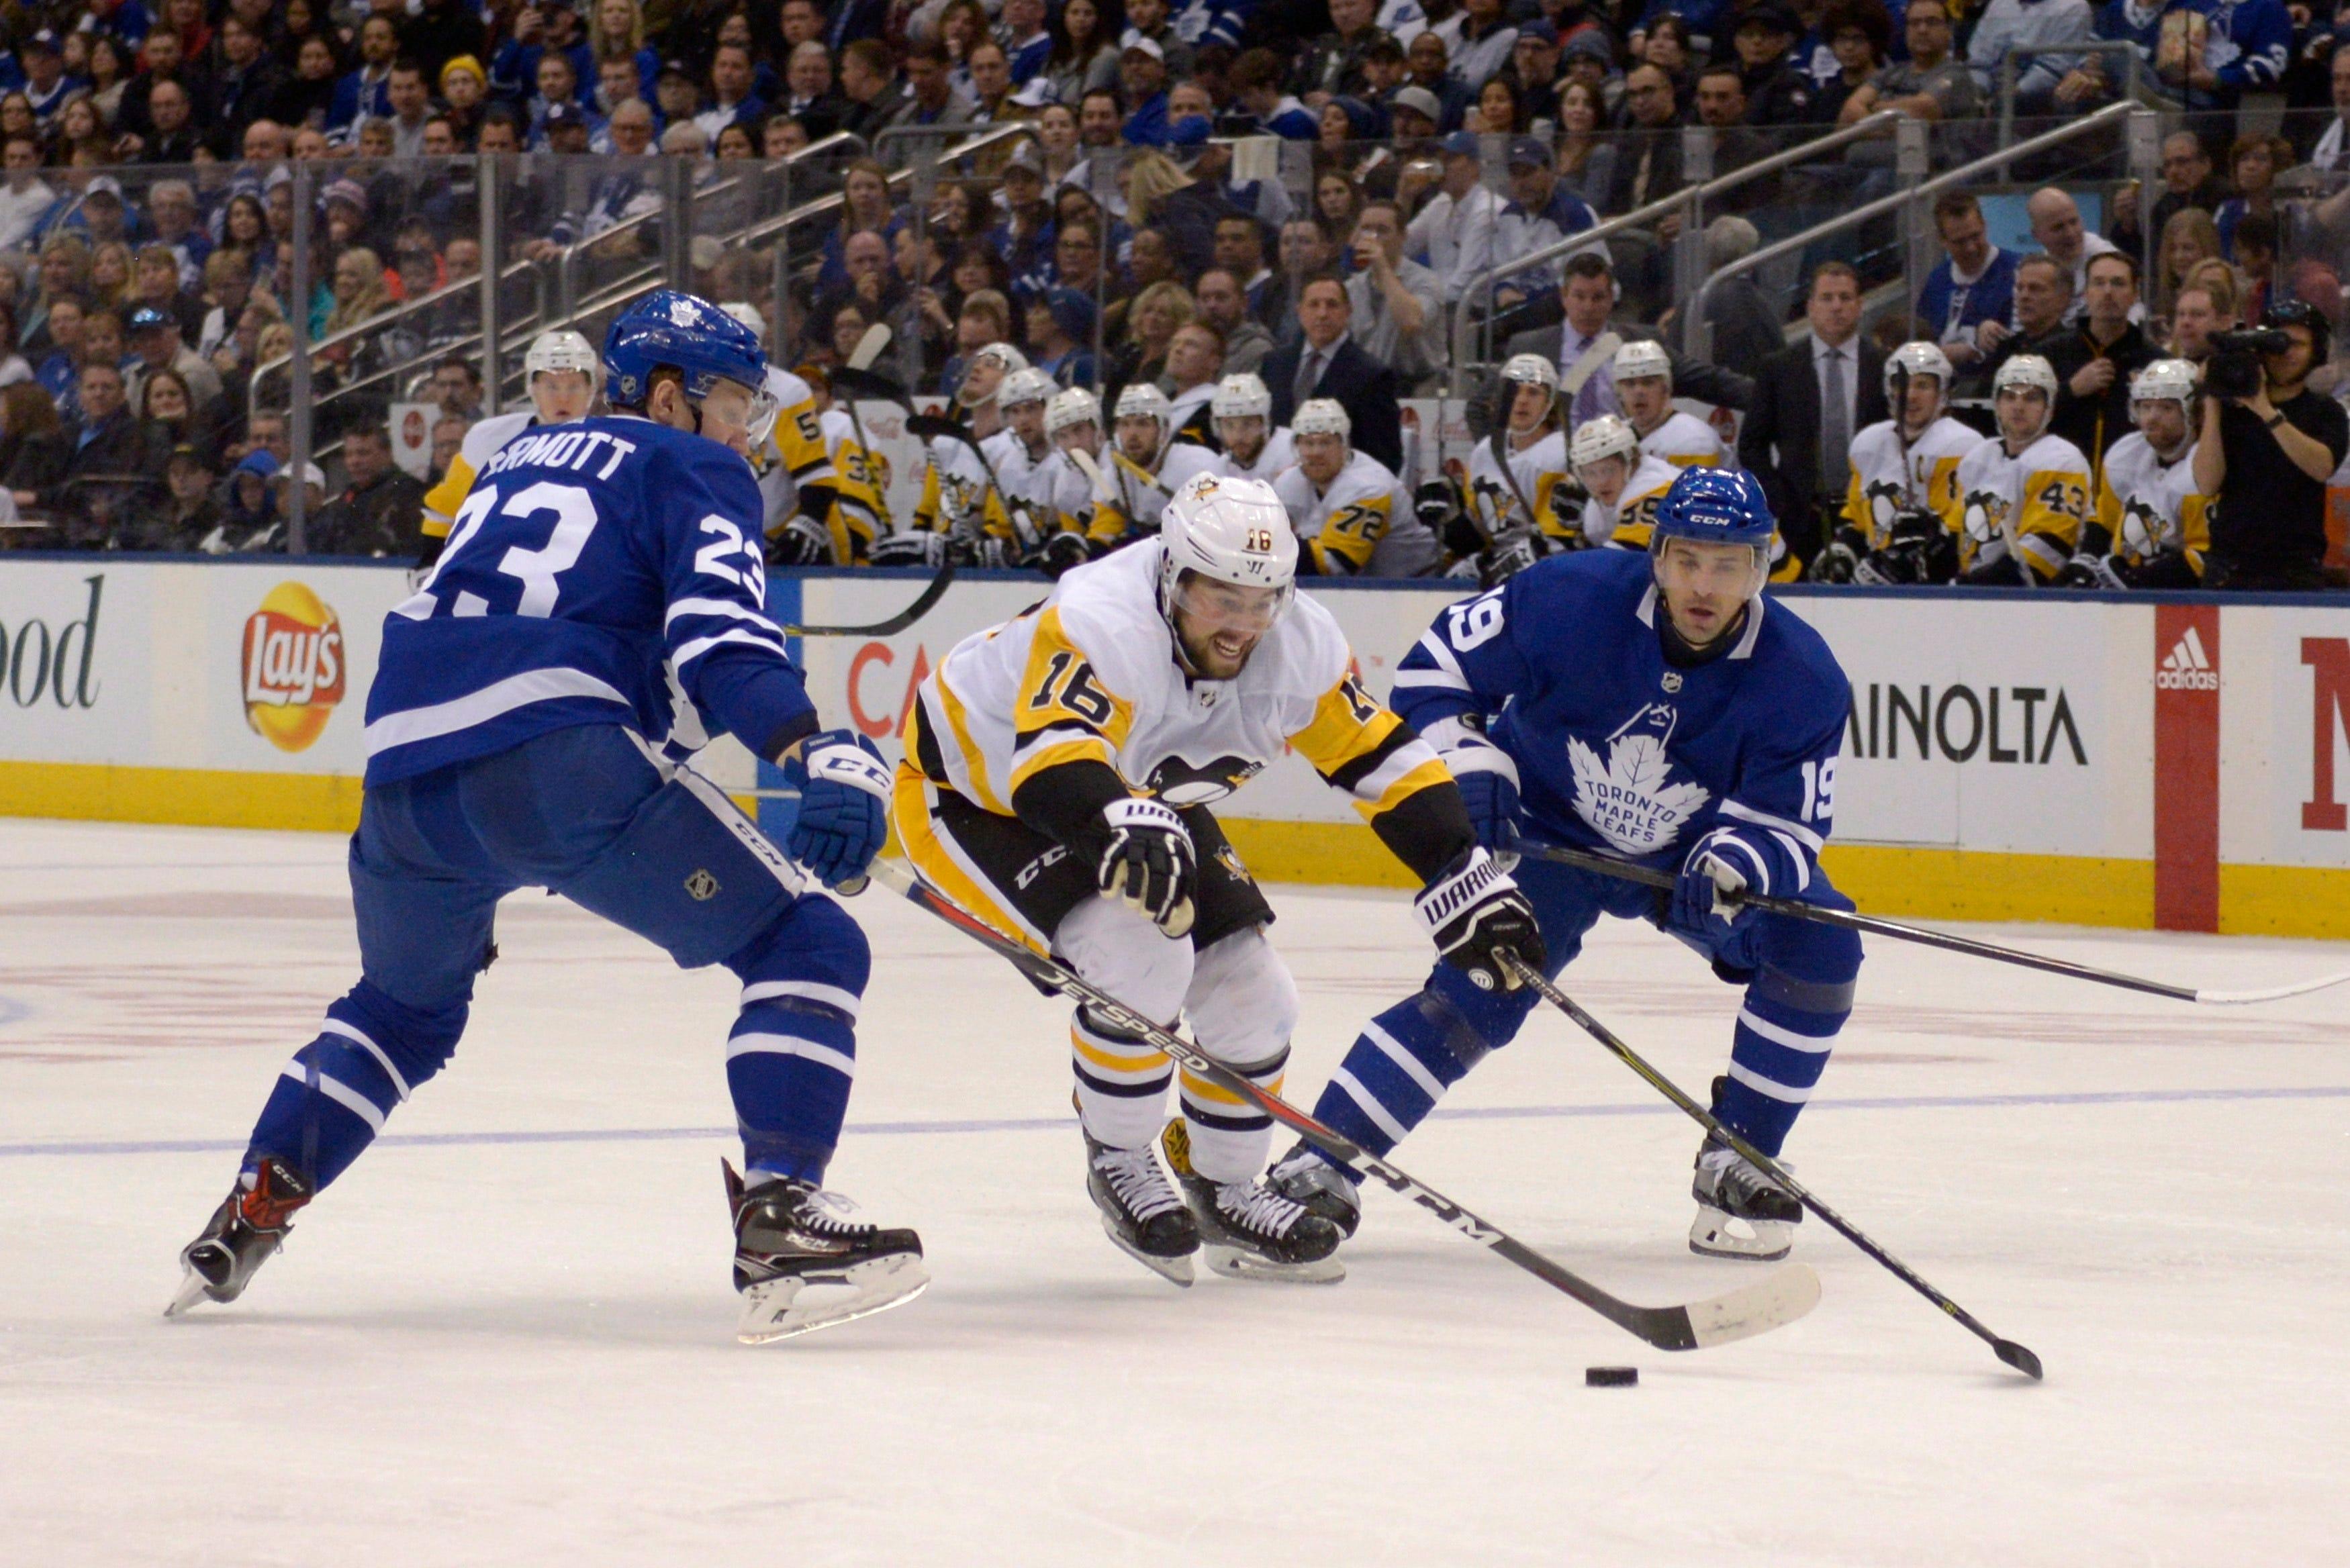 Kadri scores 2 as Maple Leafs beat Penguins to snap skid